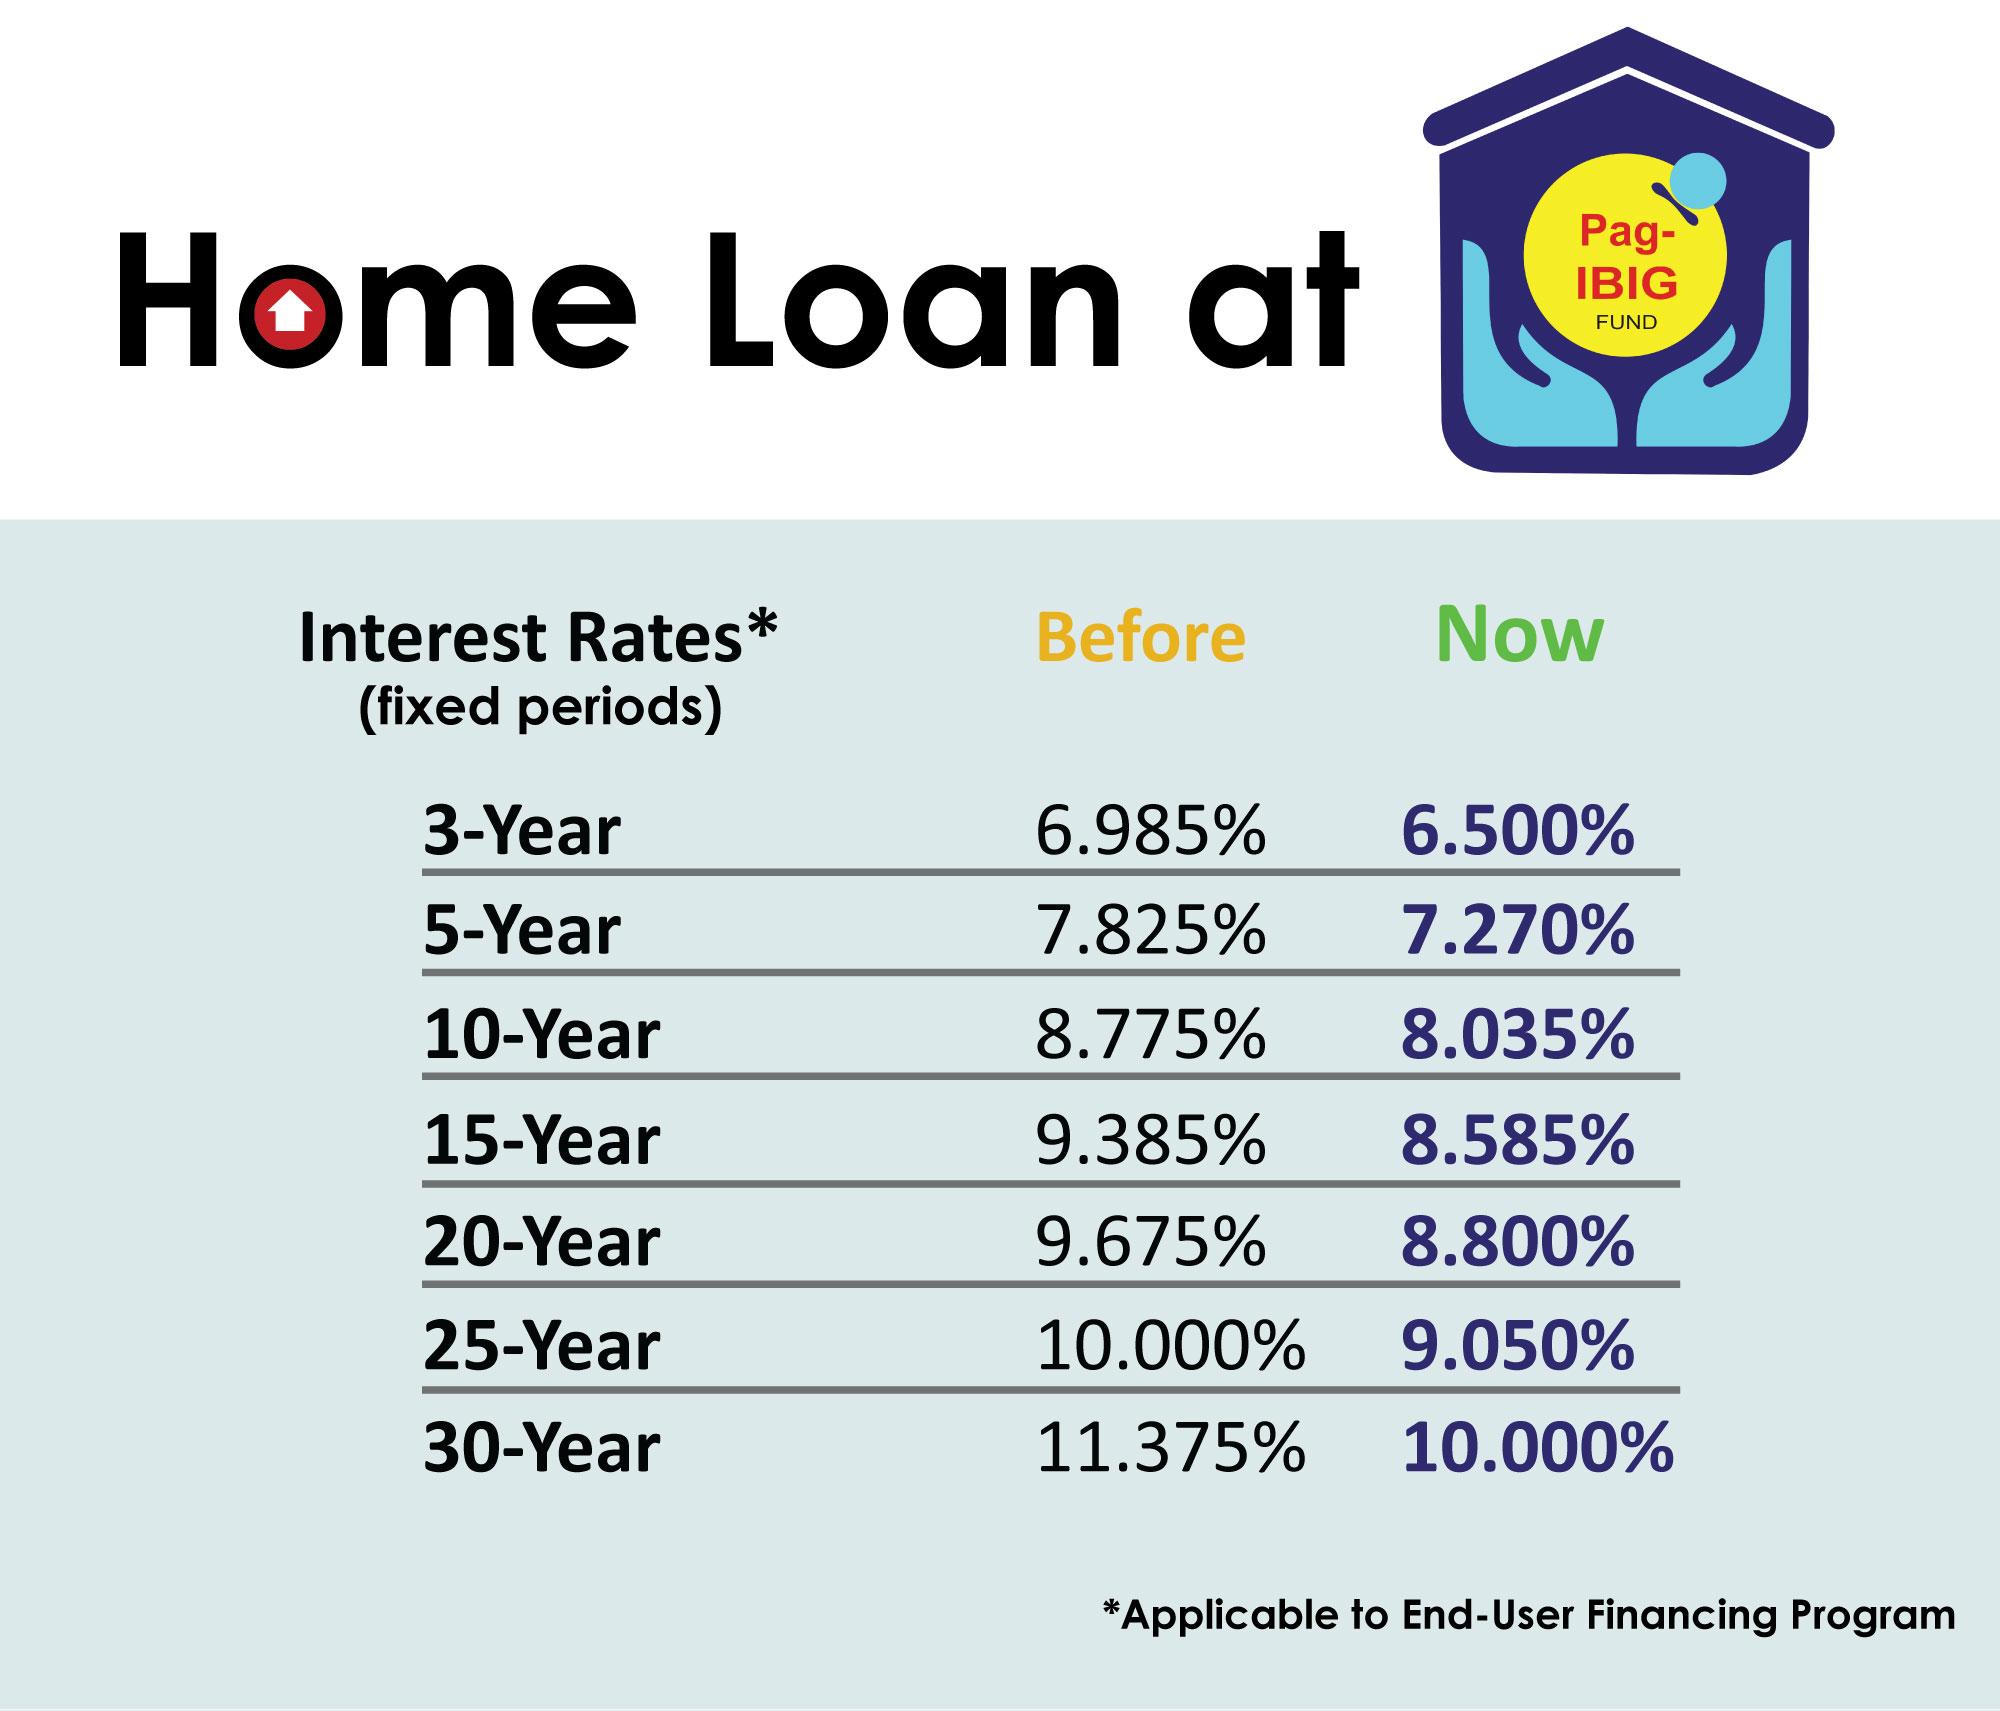 Www Pag Ibig Housing Loan